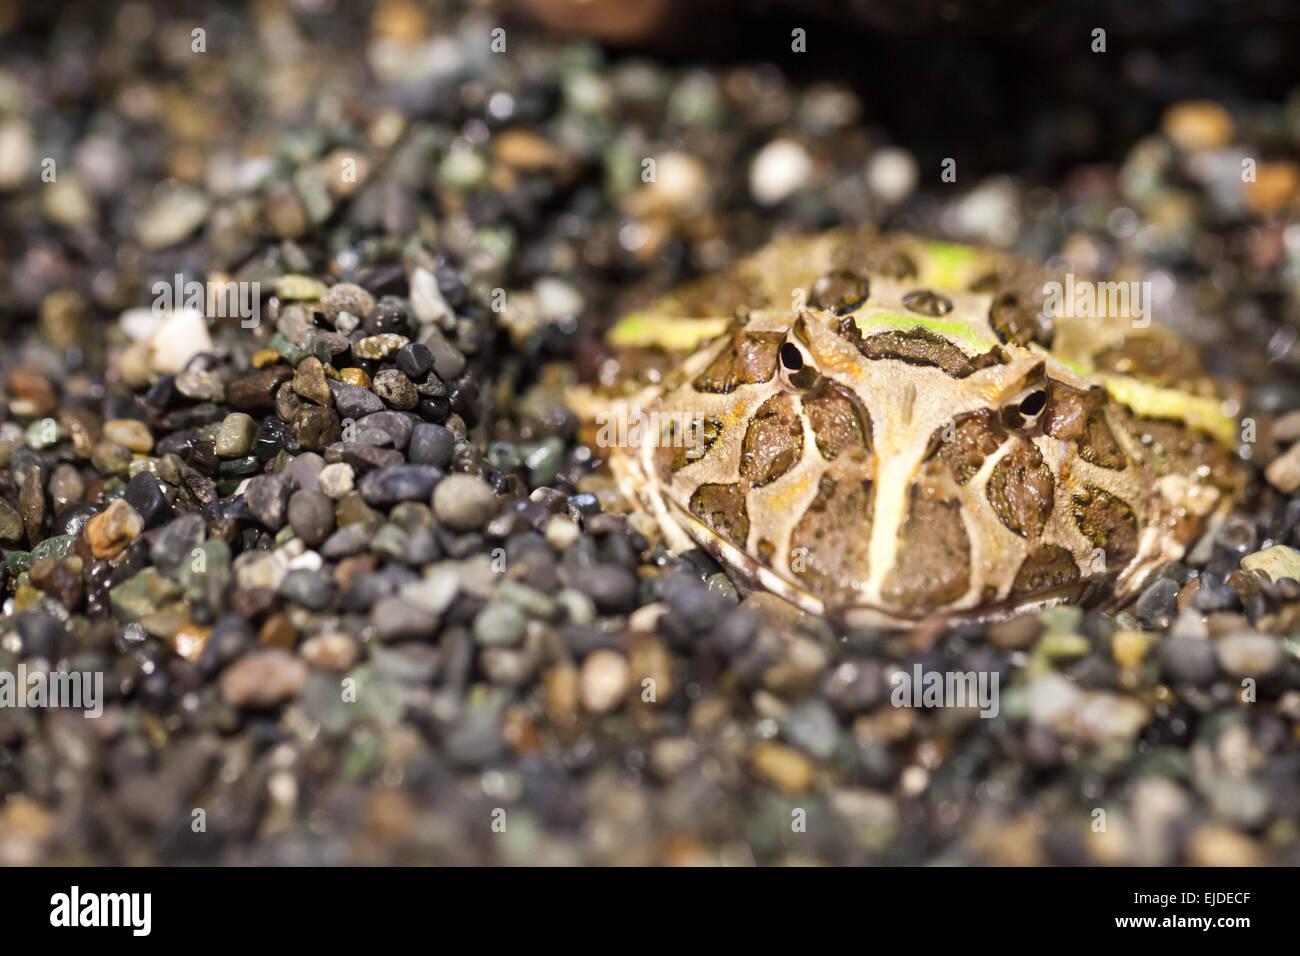 frog in natural habitat - Stock Image